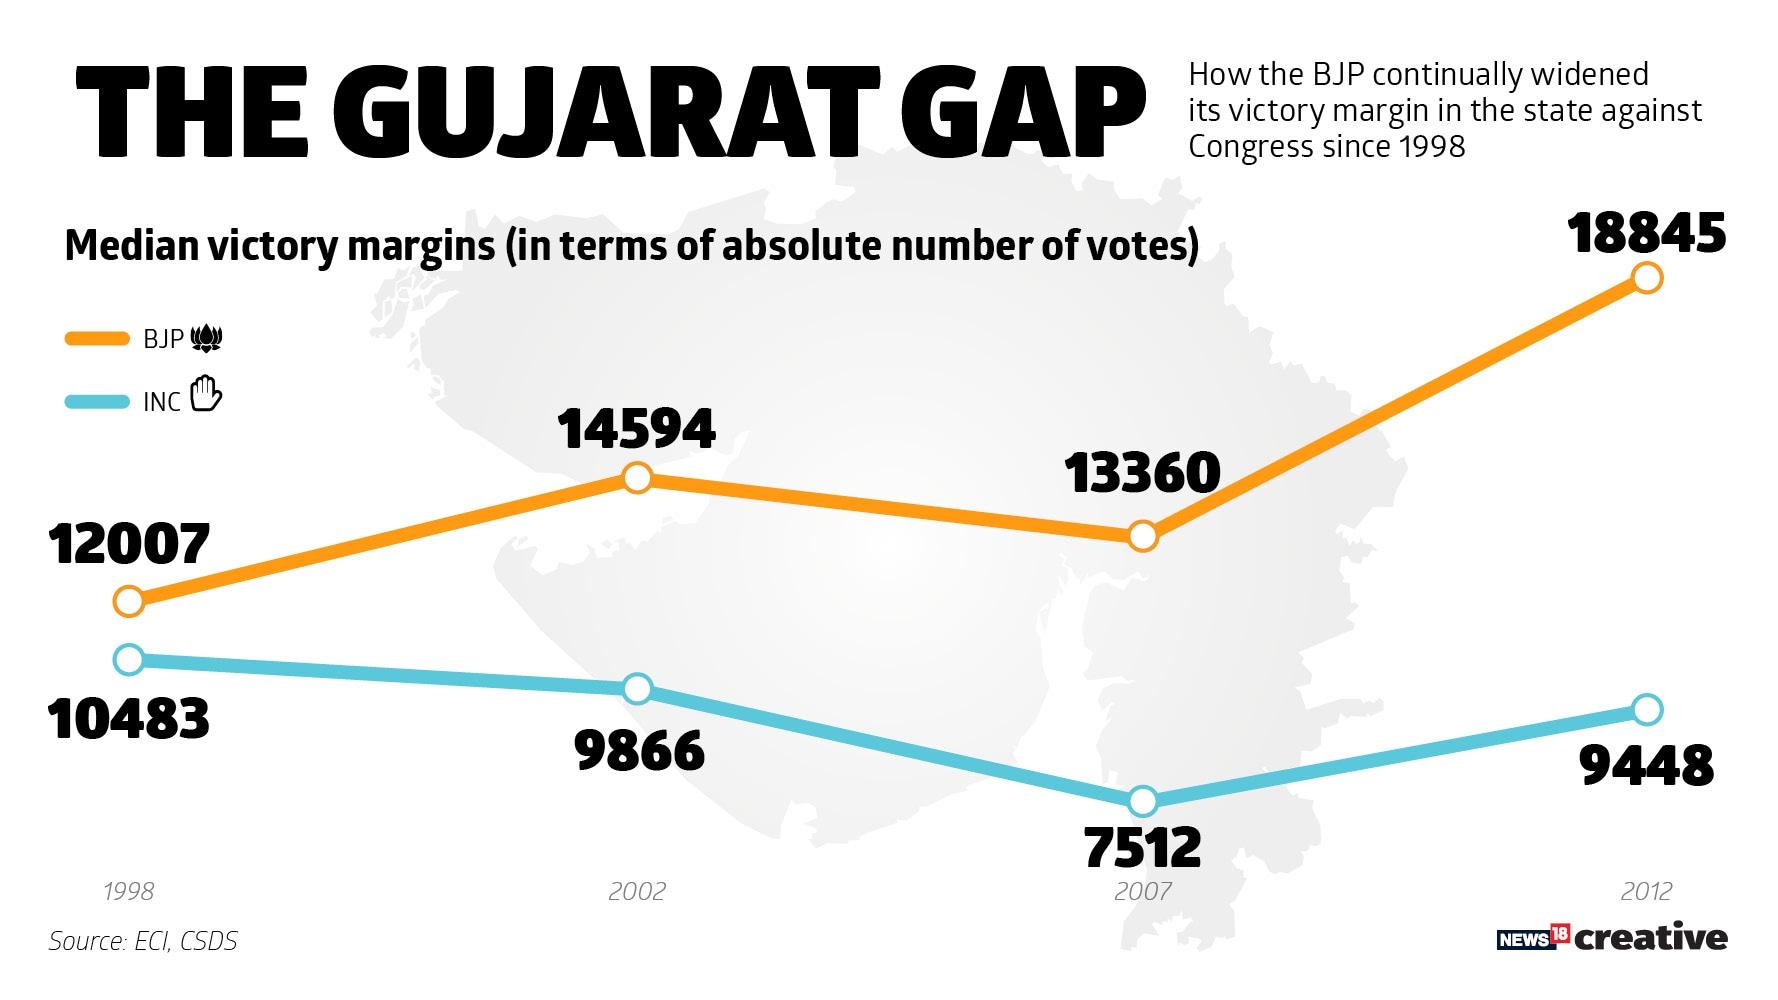 BJP-Cong victory margins